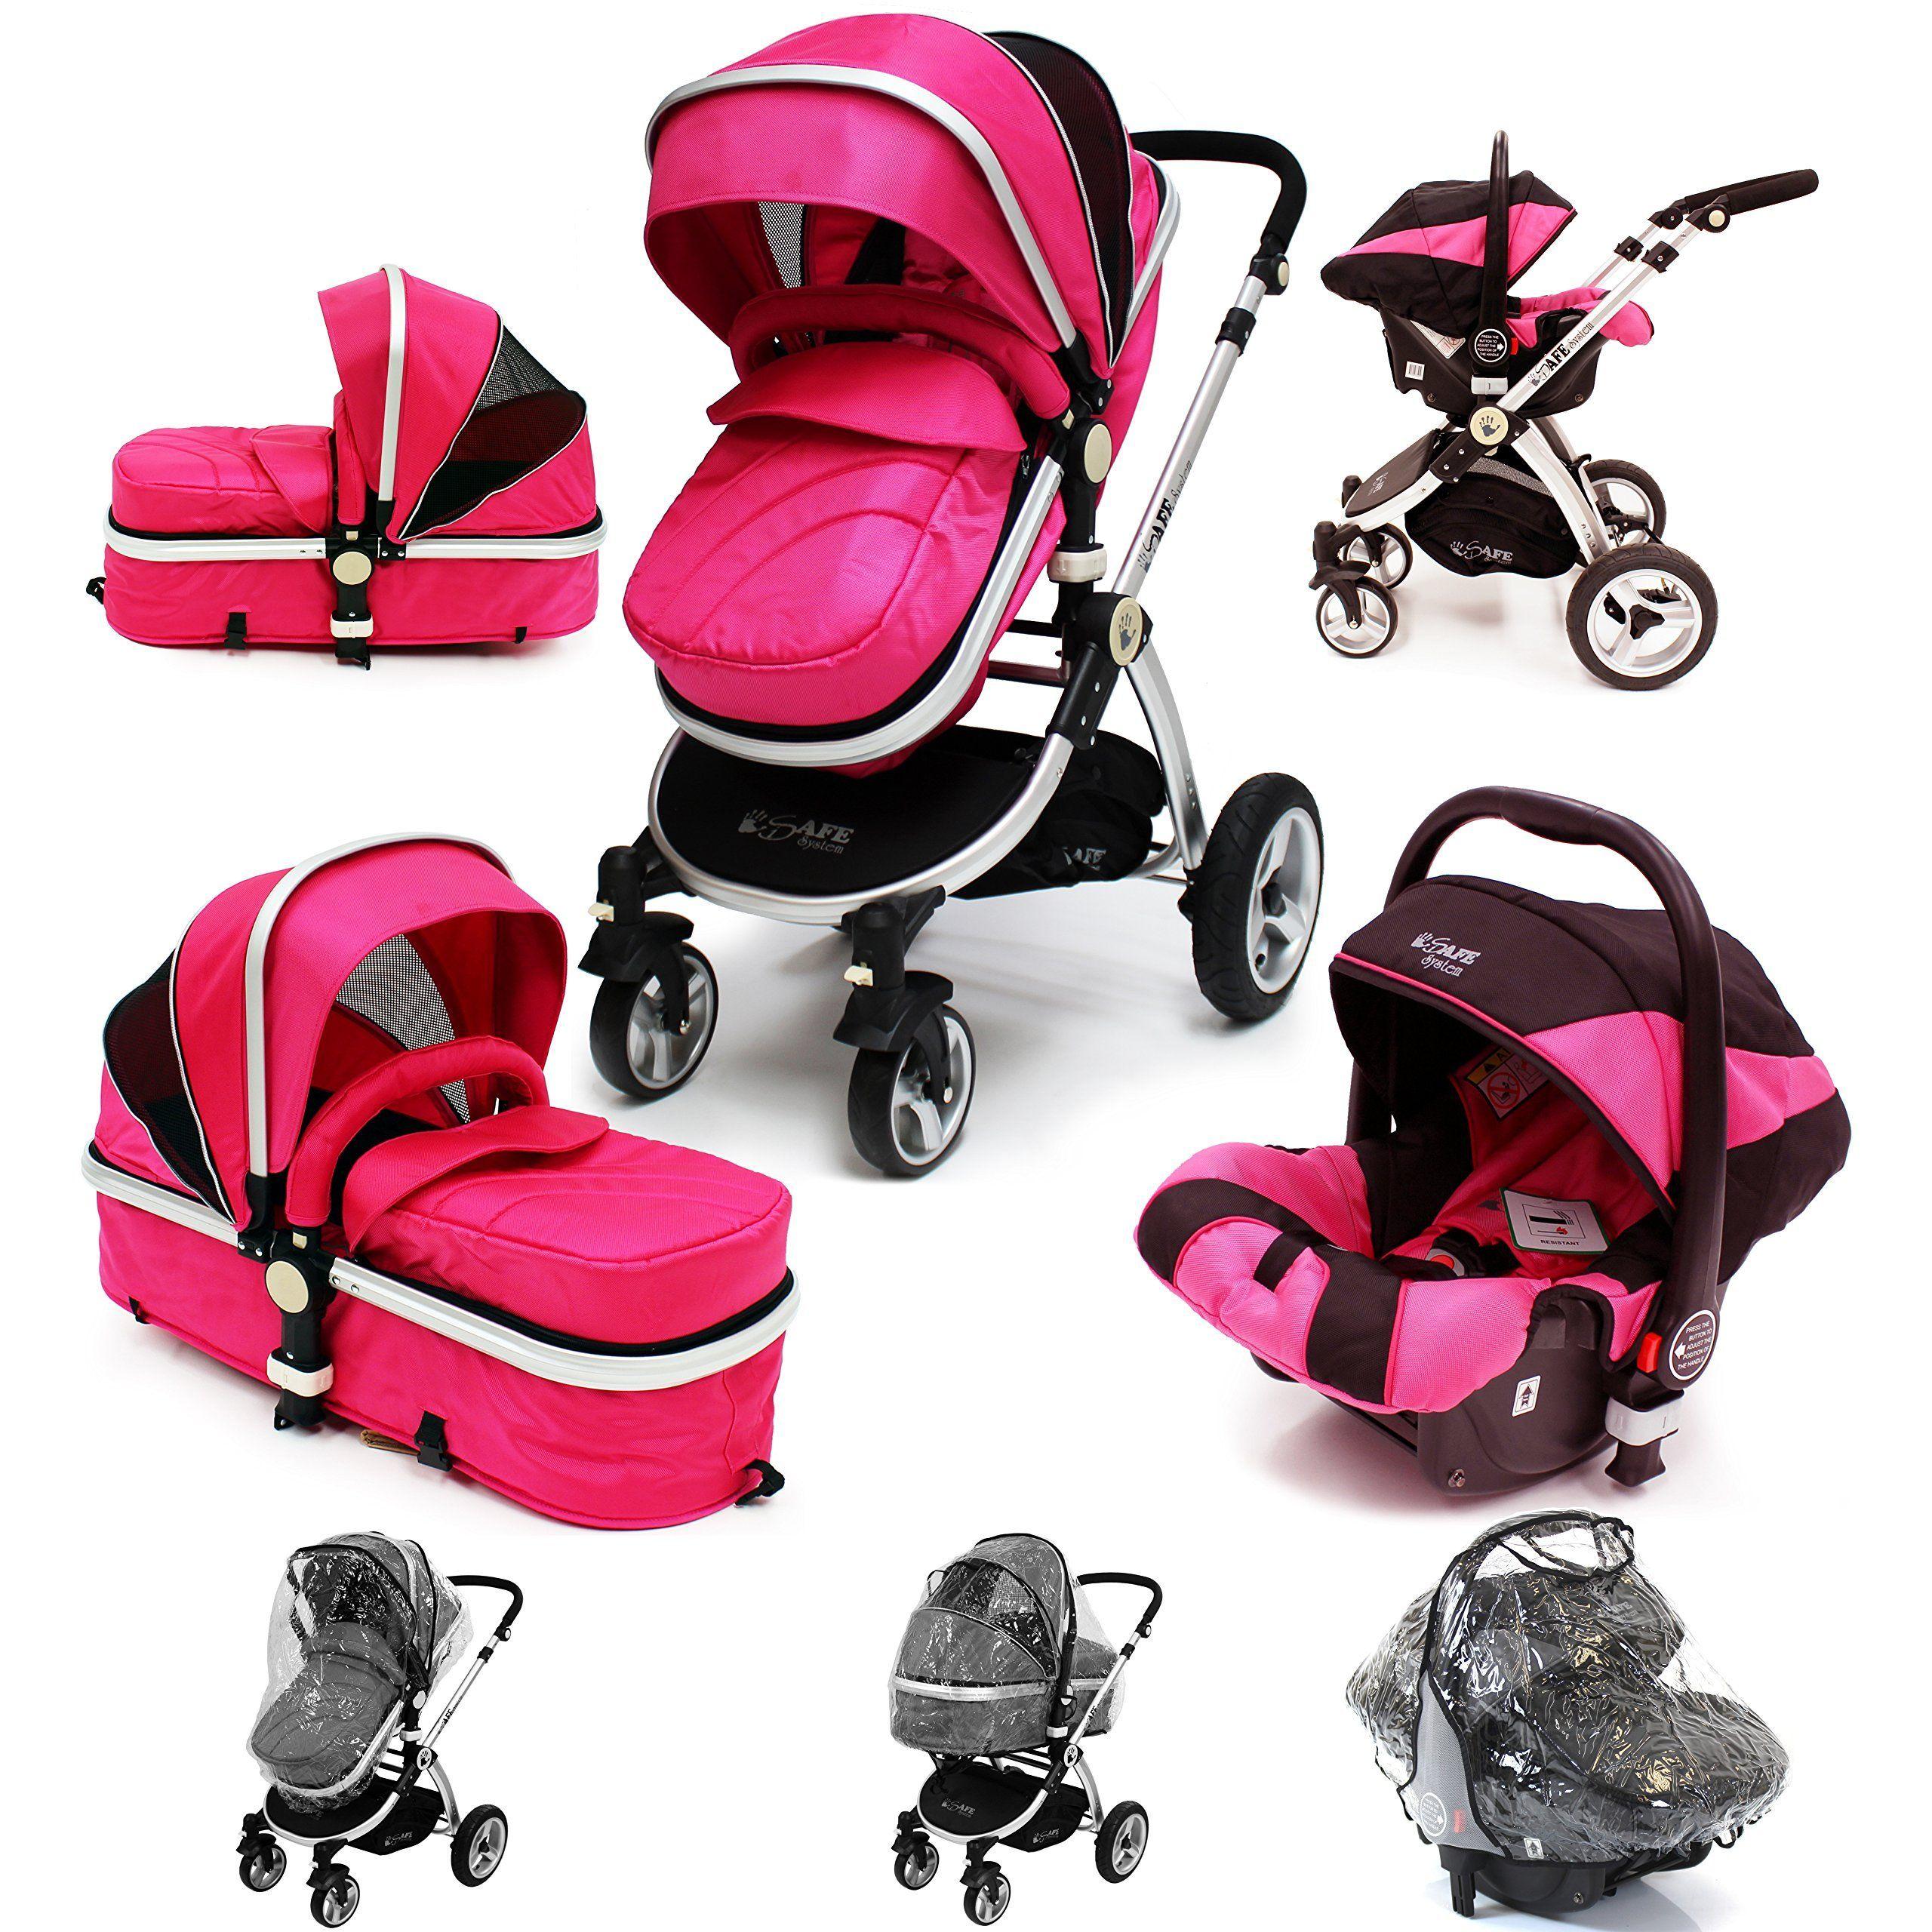 nursery bedding Prams, pushchairs, Baby strollers, All